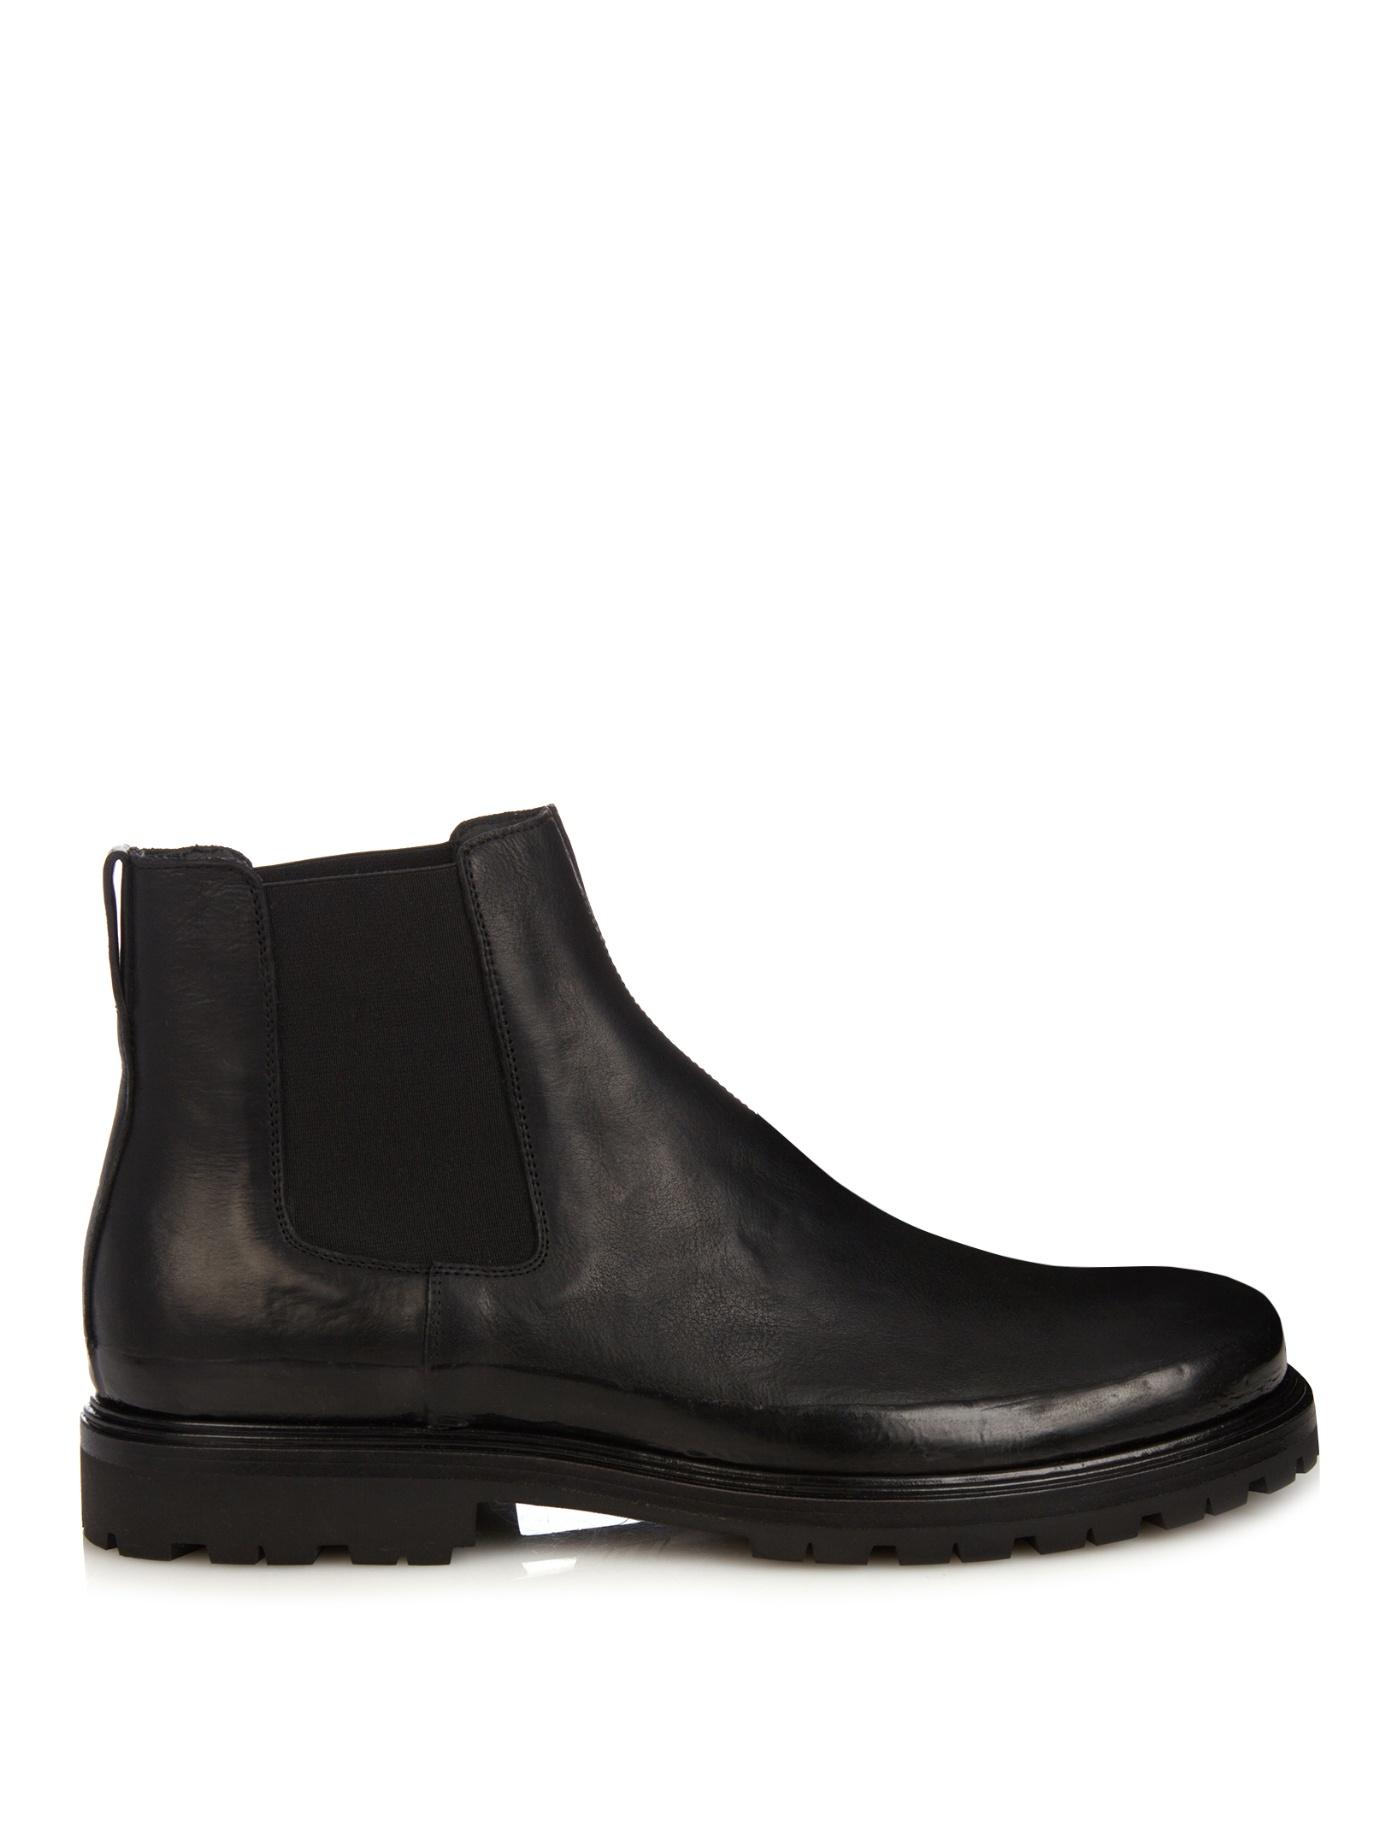 New Bottega Veneta Womens Brogue Chelsea Boots  Befablook